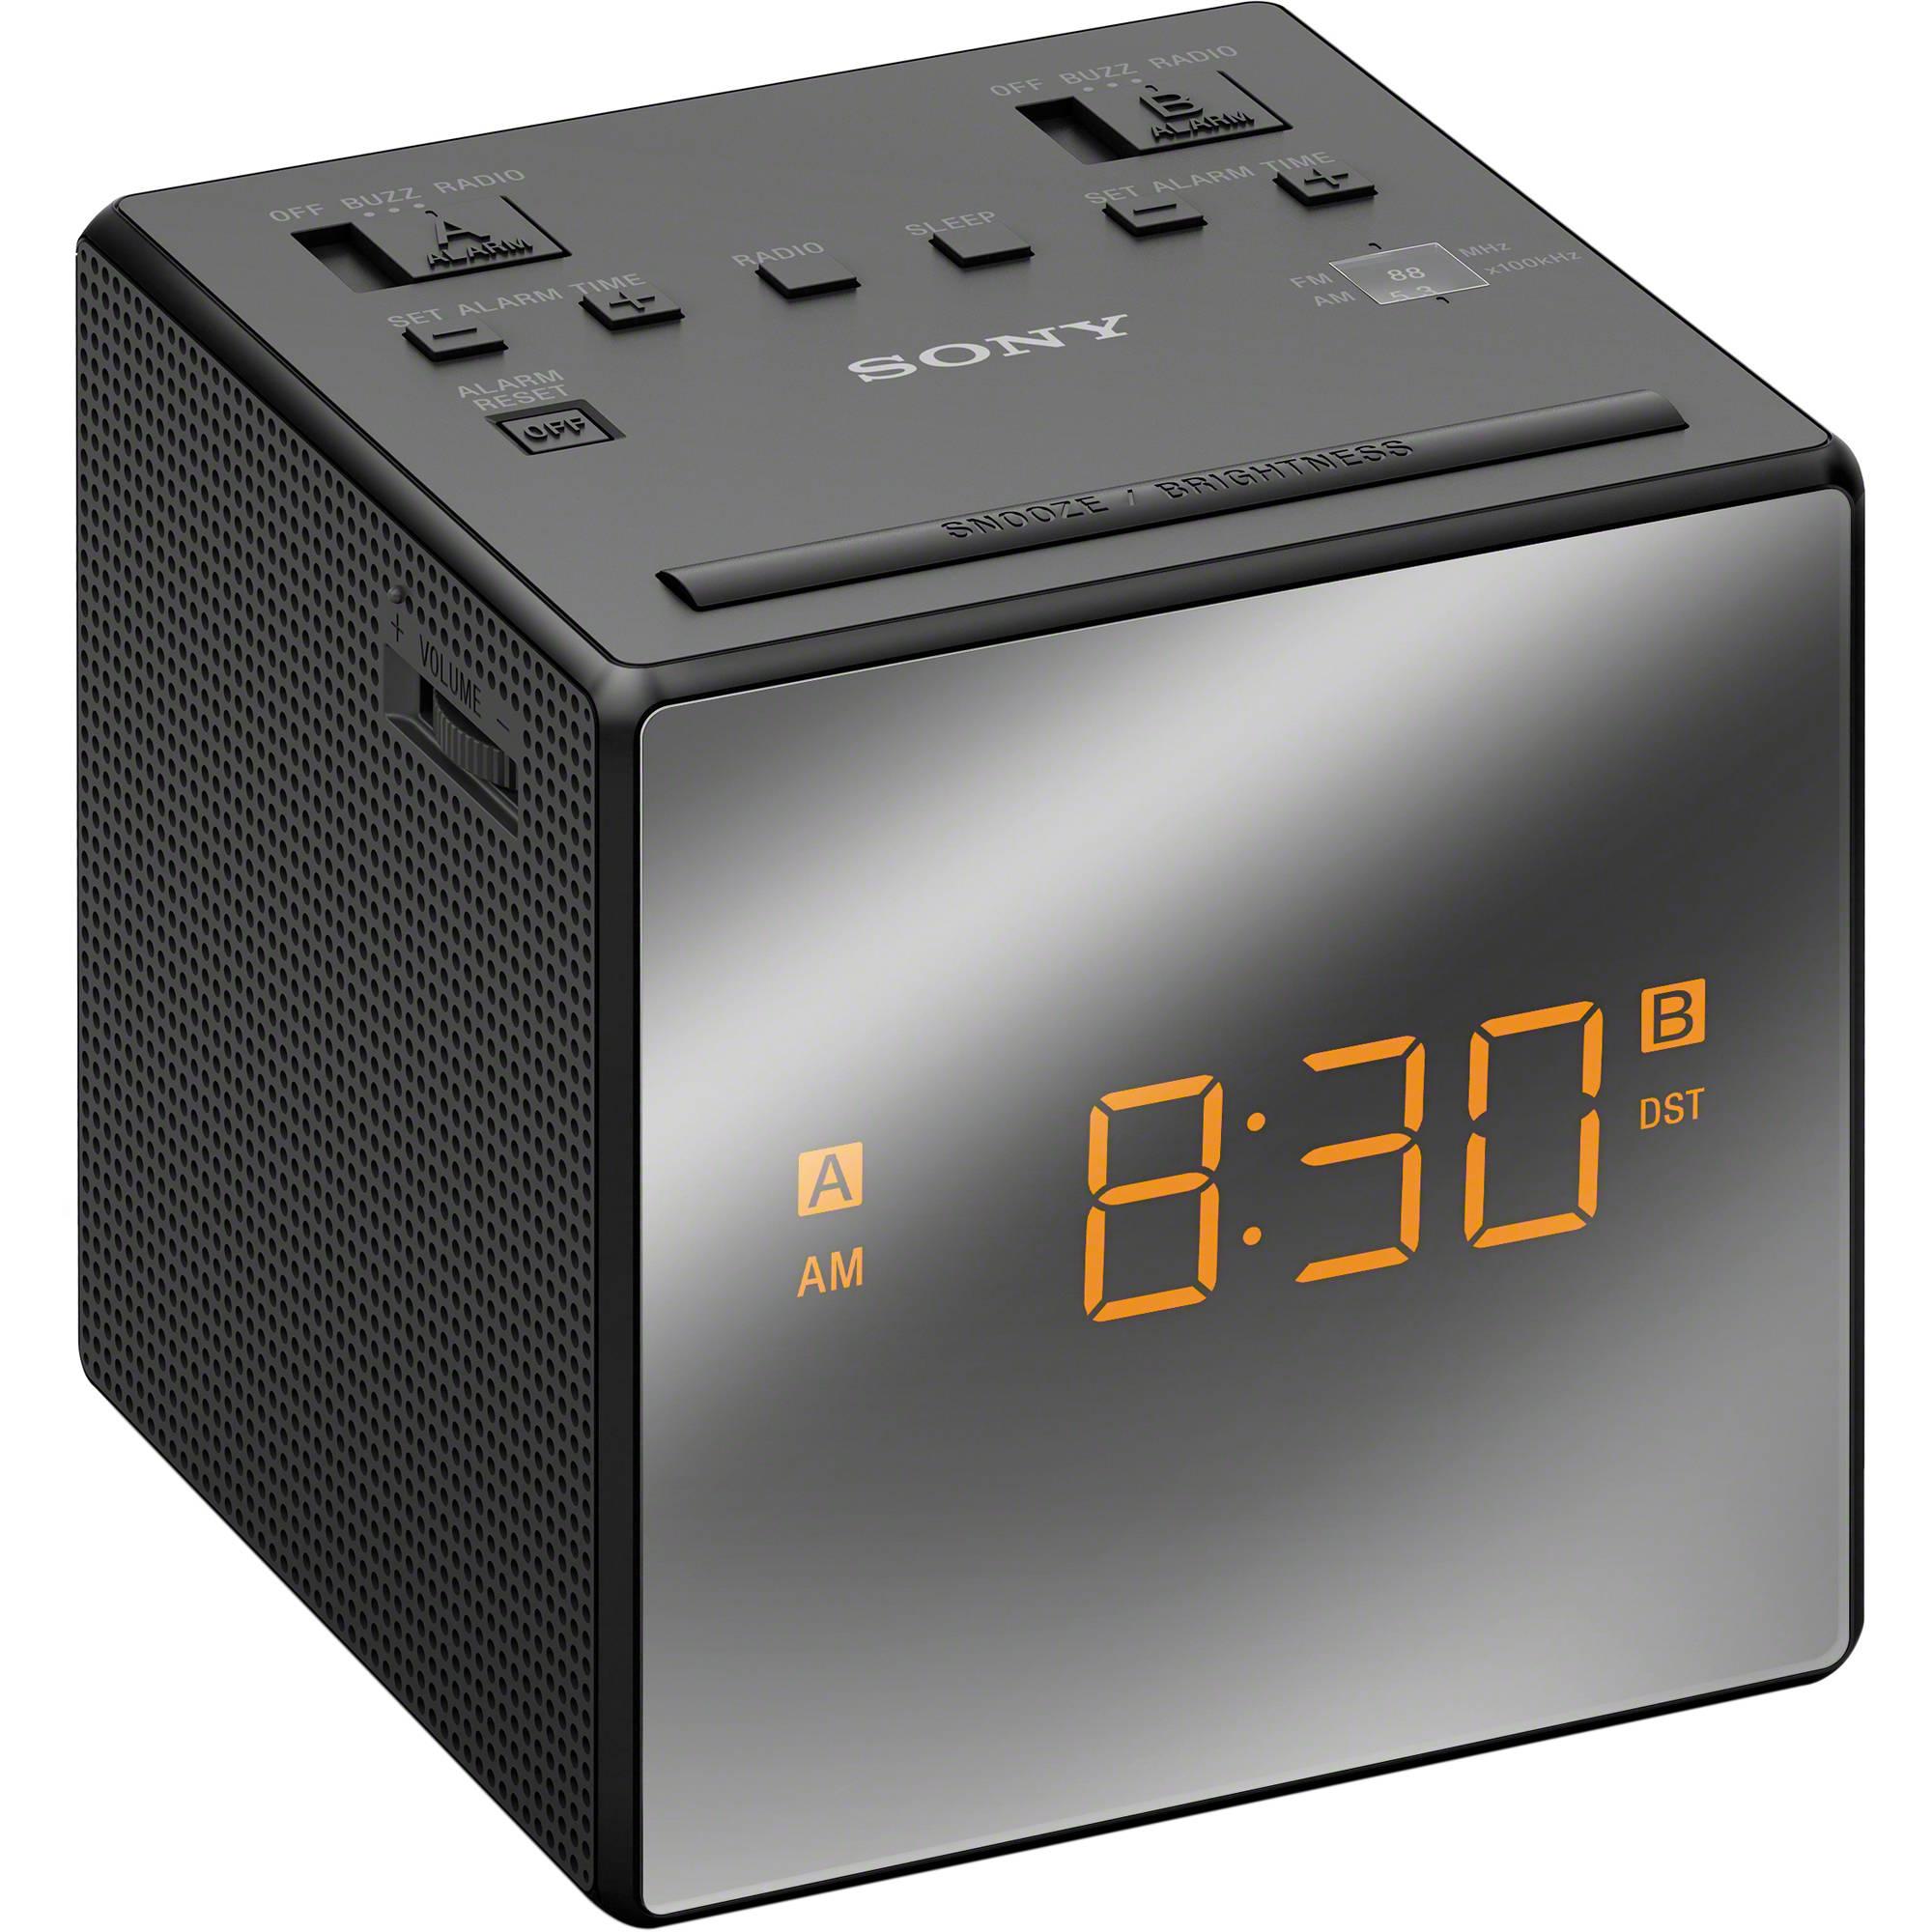 Sony Dual Alarm Clock Radio Black Icfc1tblack Bh Photo Video